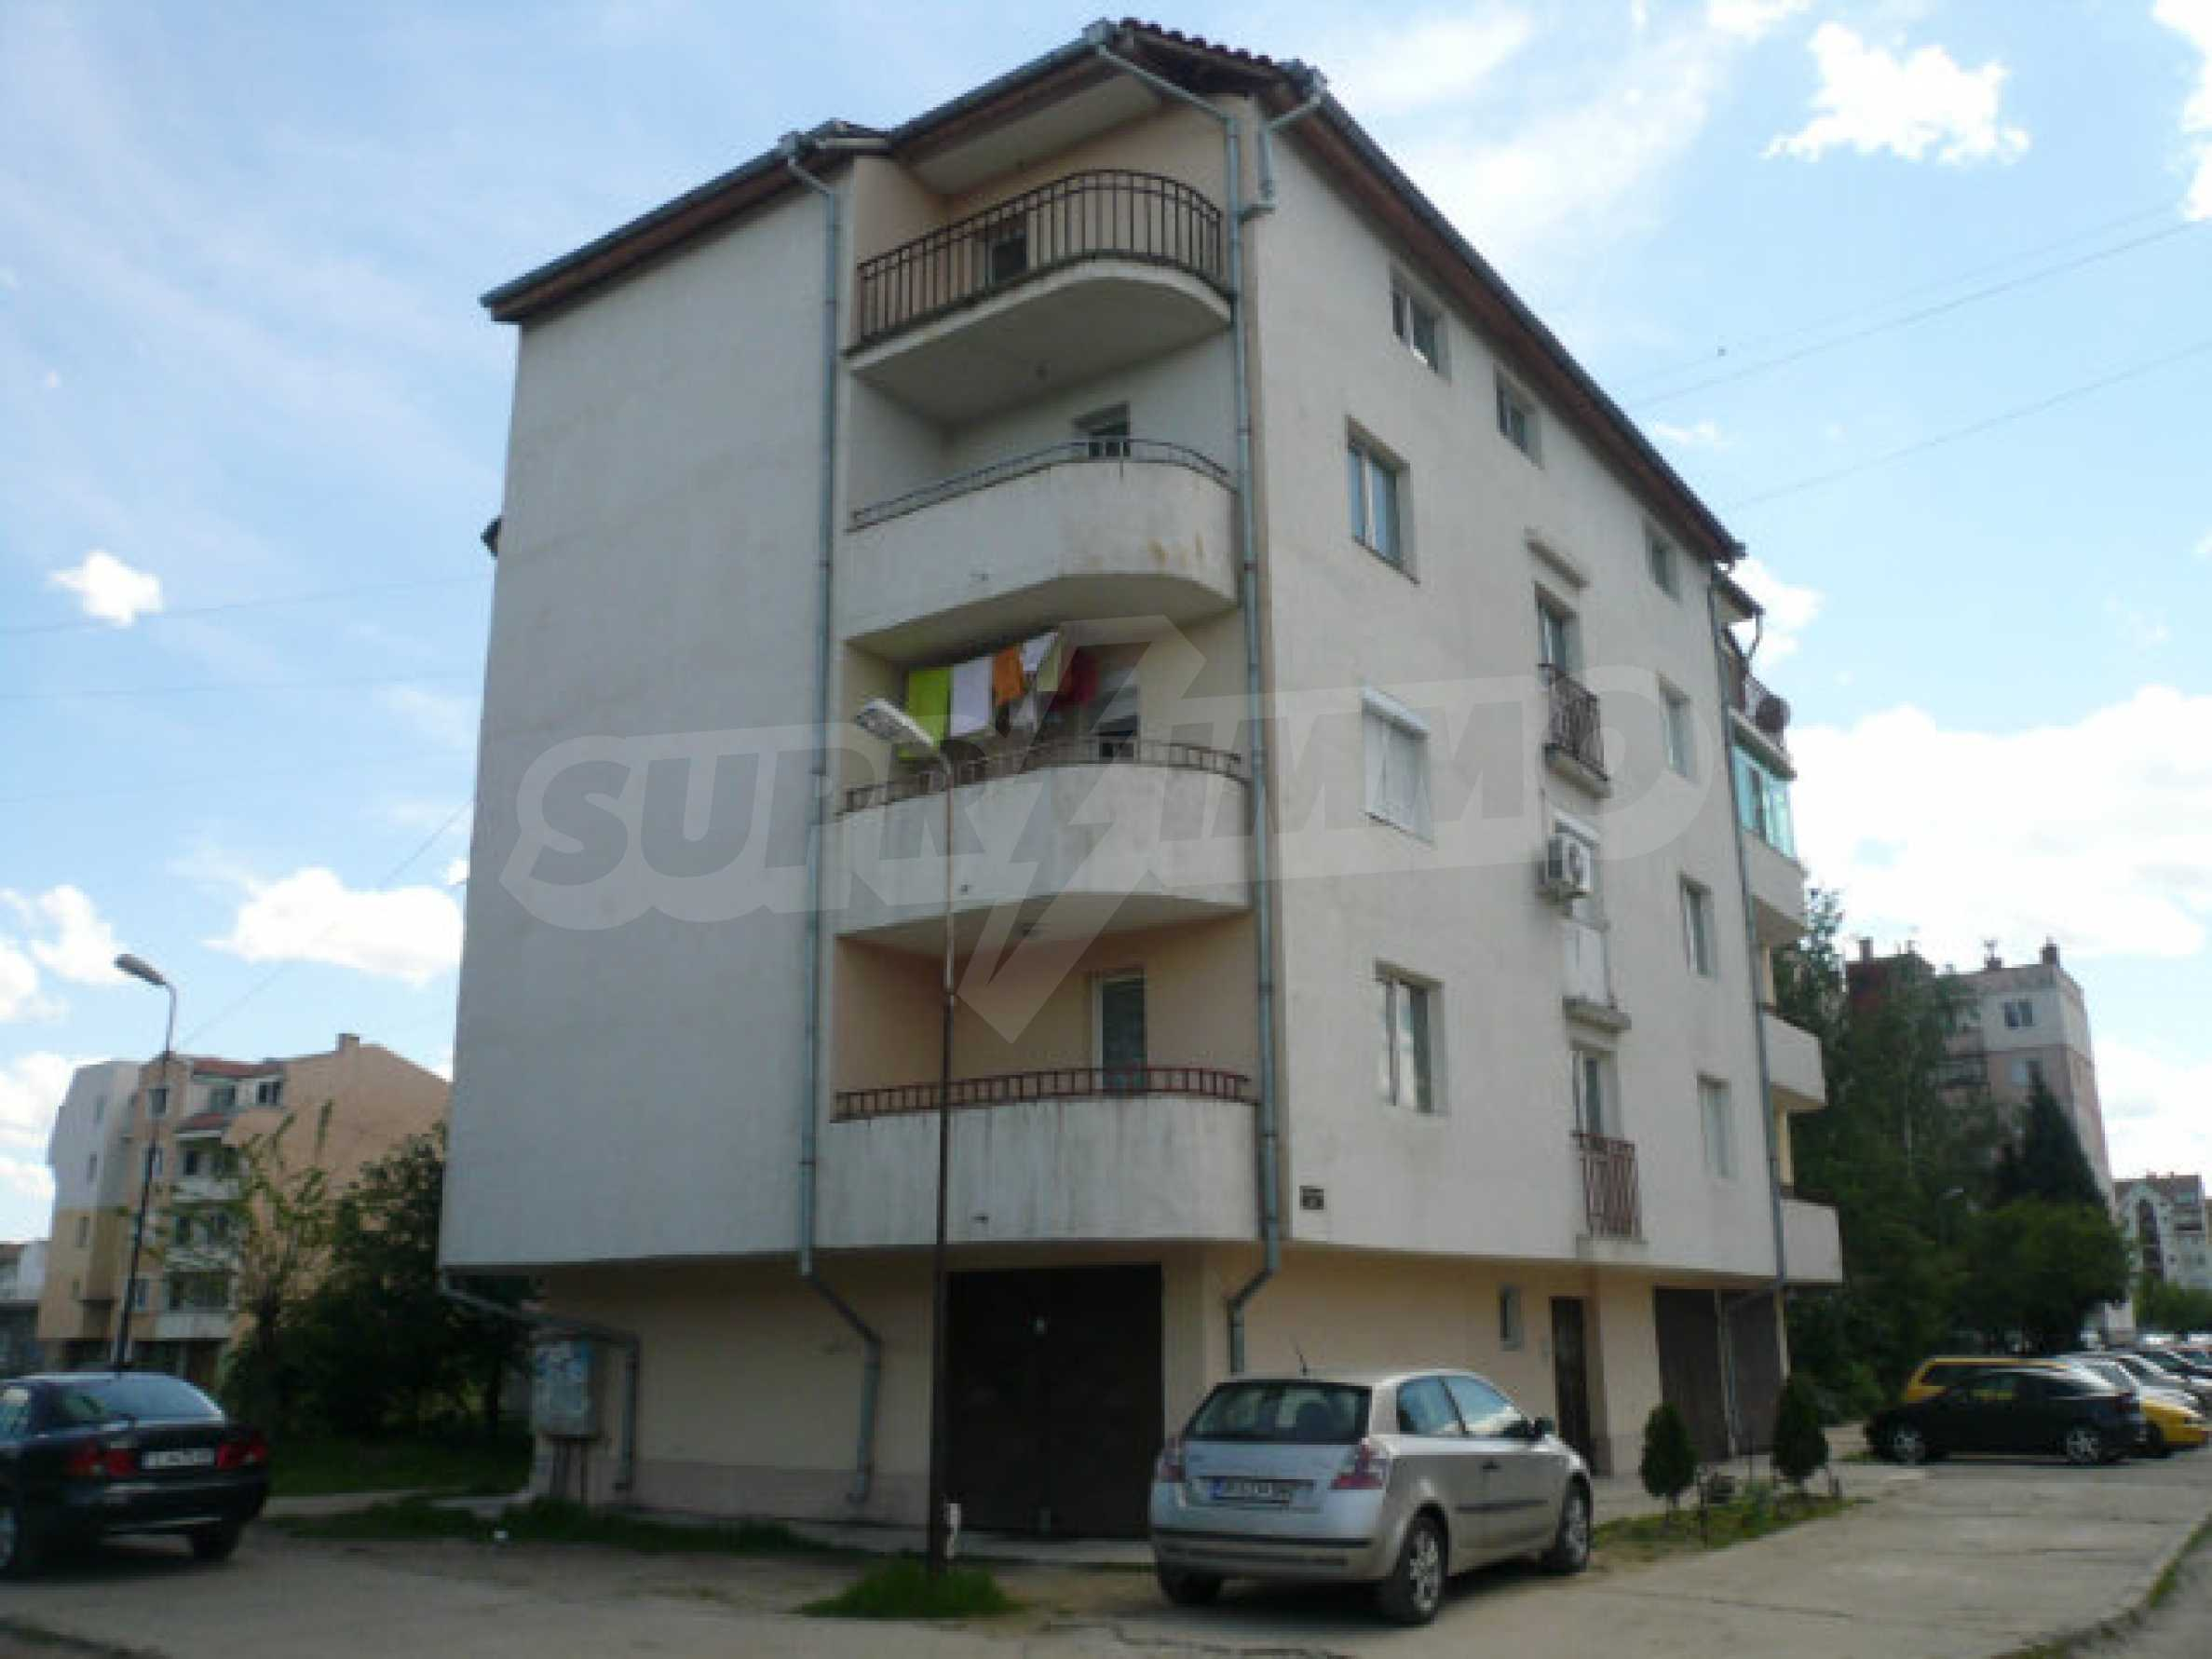 Two-bedroom apartment in Vidin